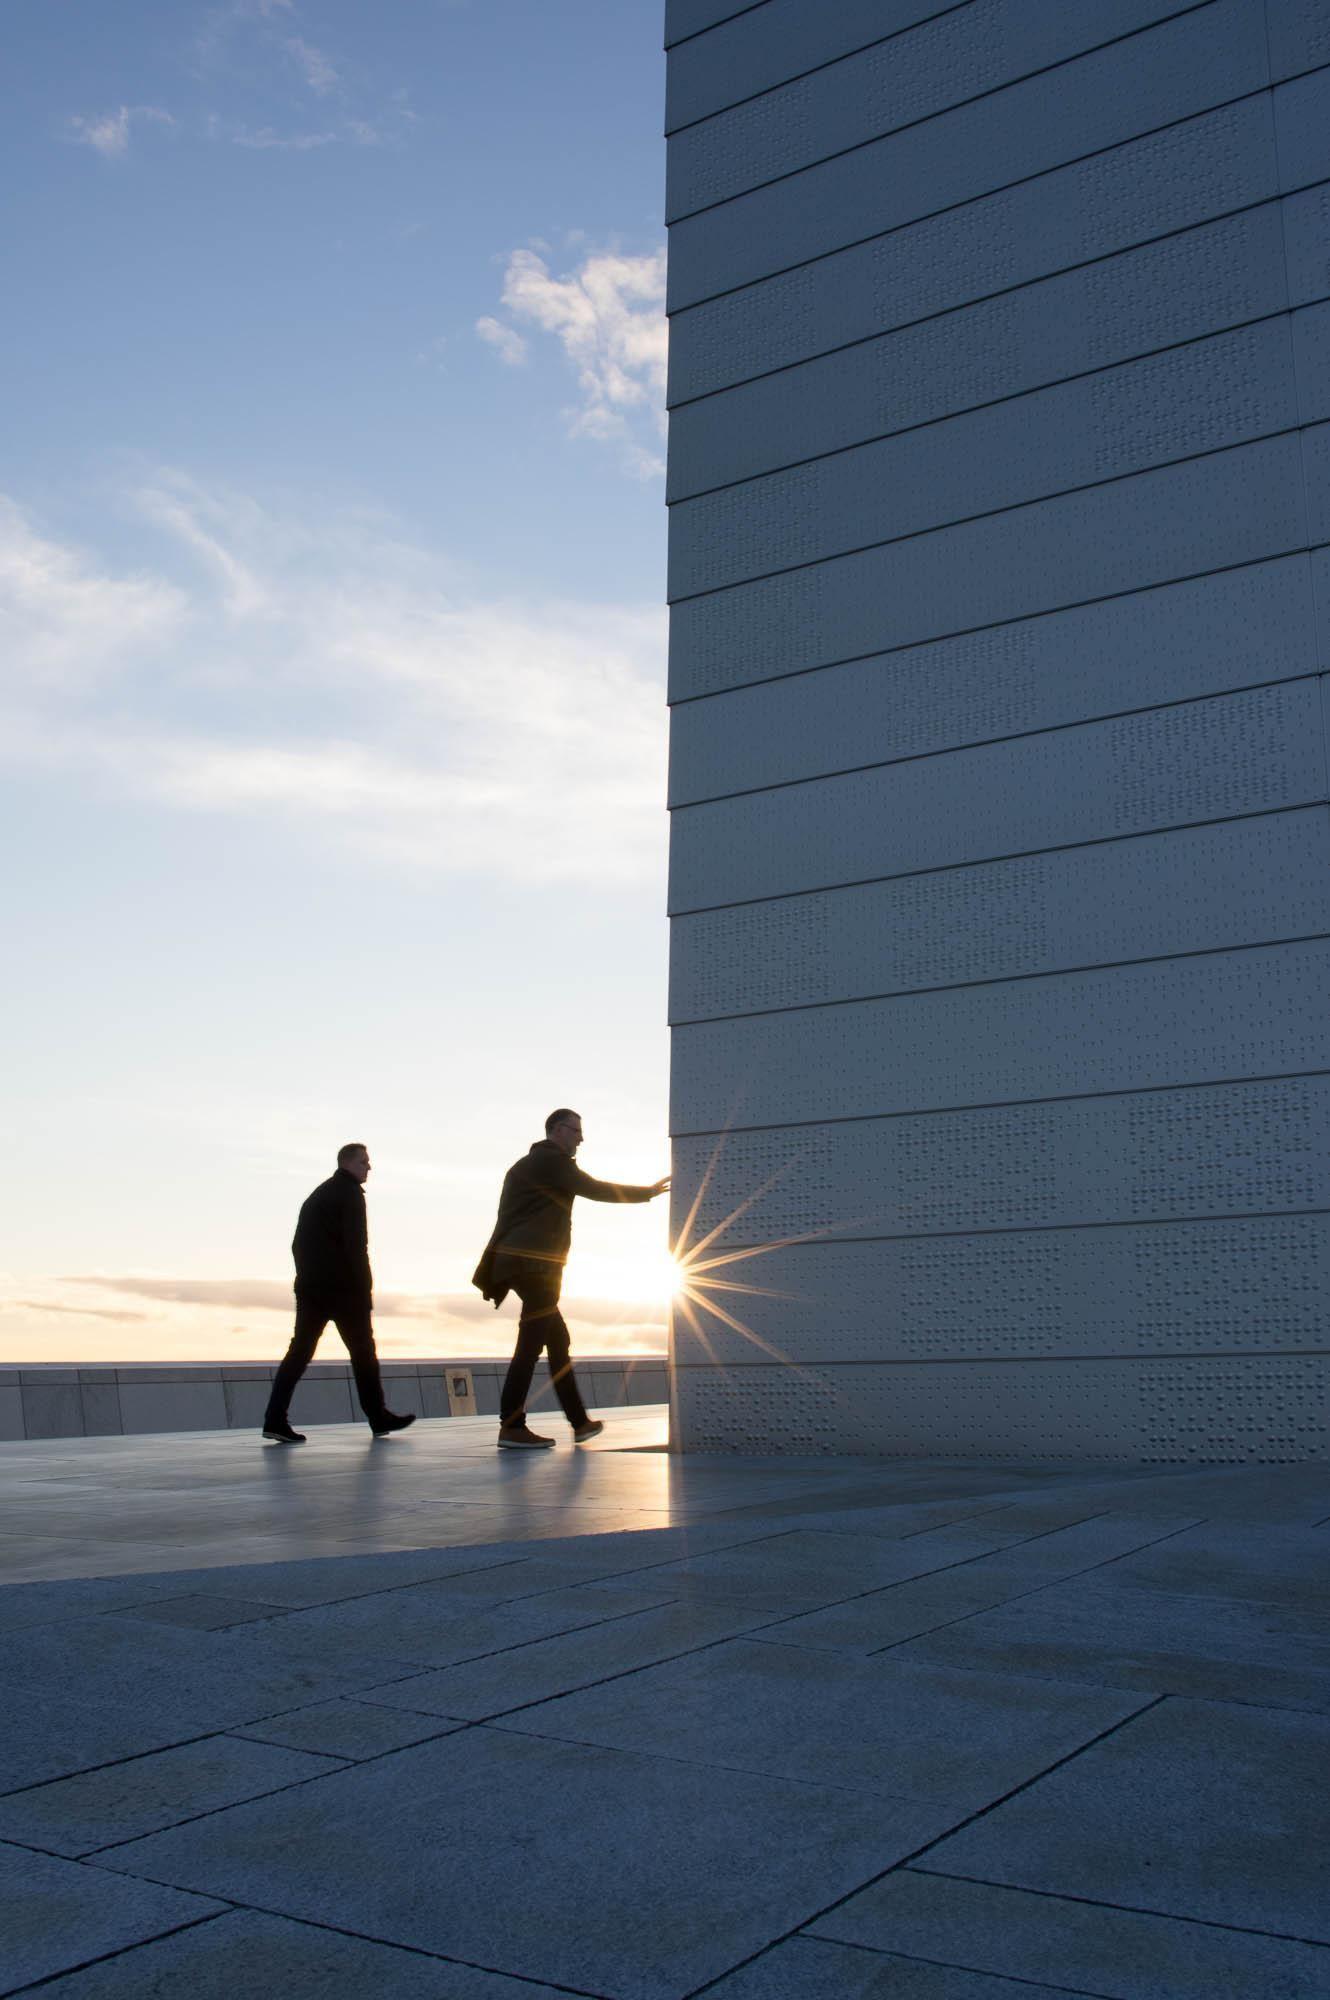 ITAP of someone touching a wall http://ift.tt/2nbfdSm